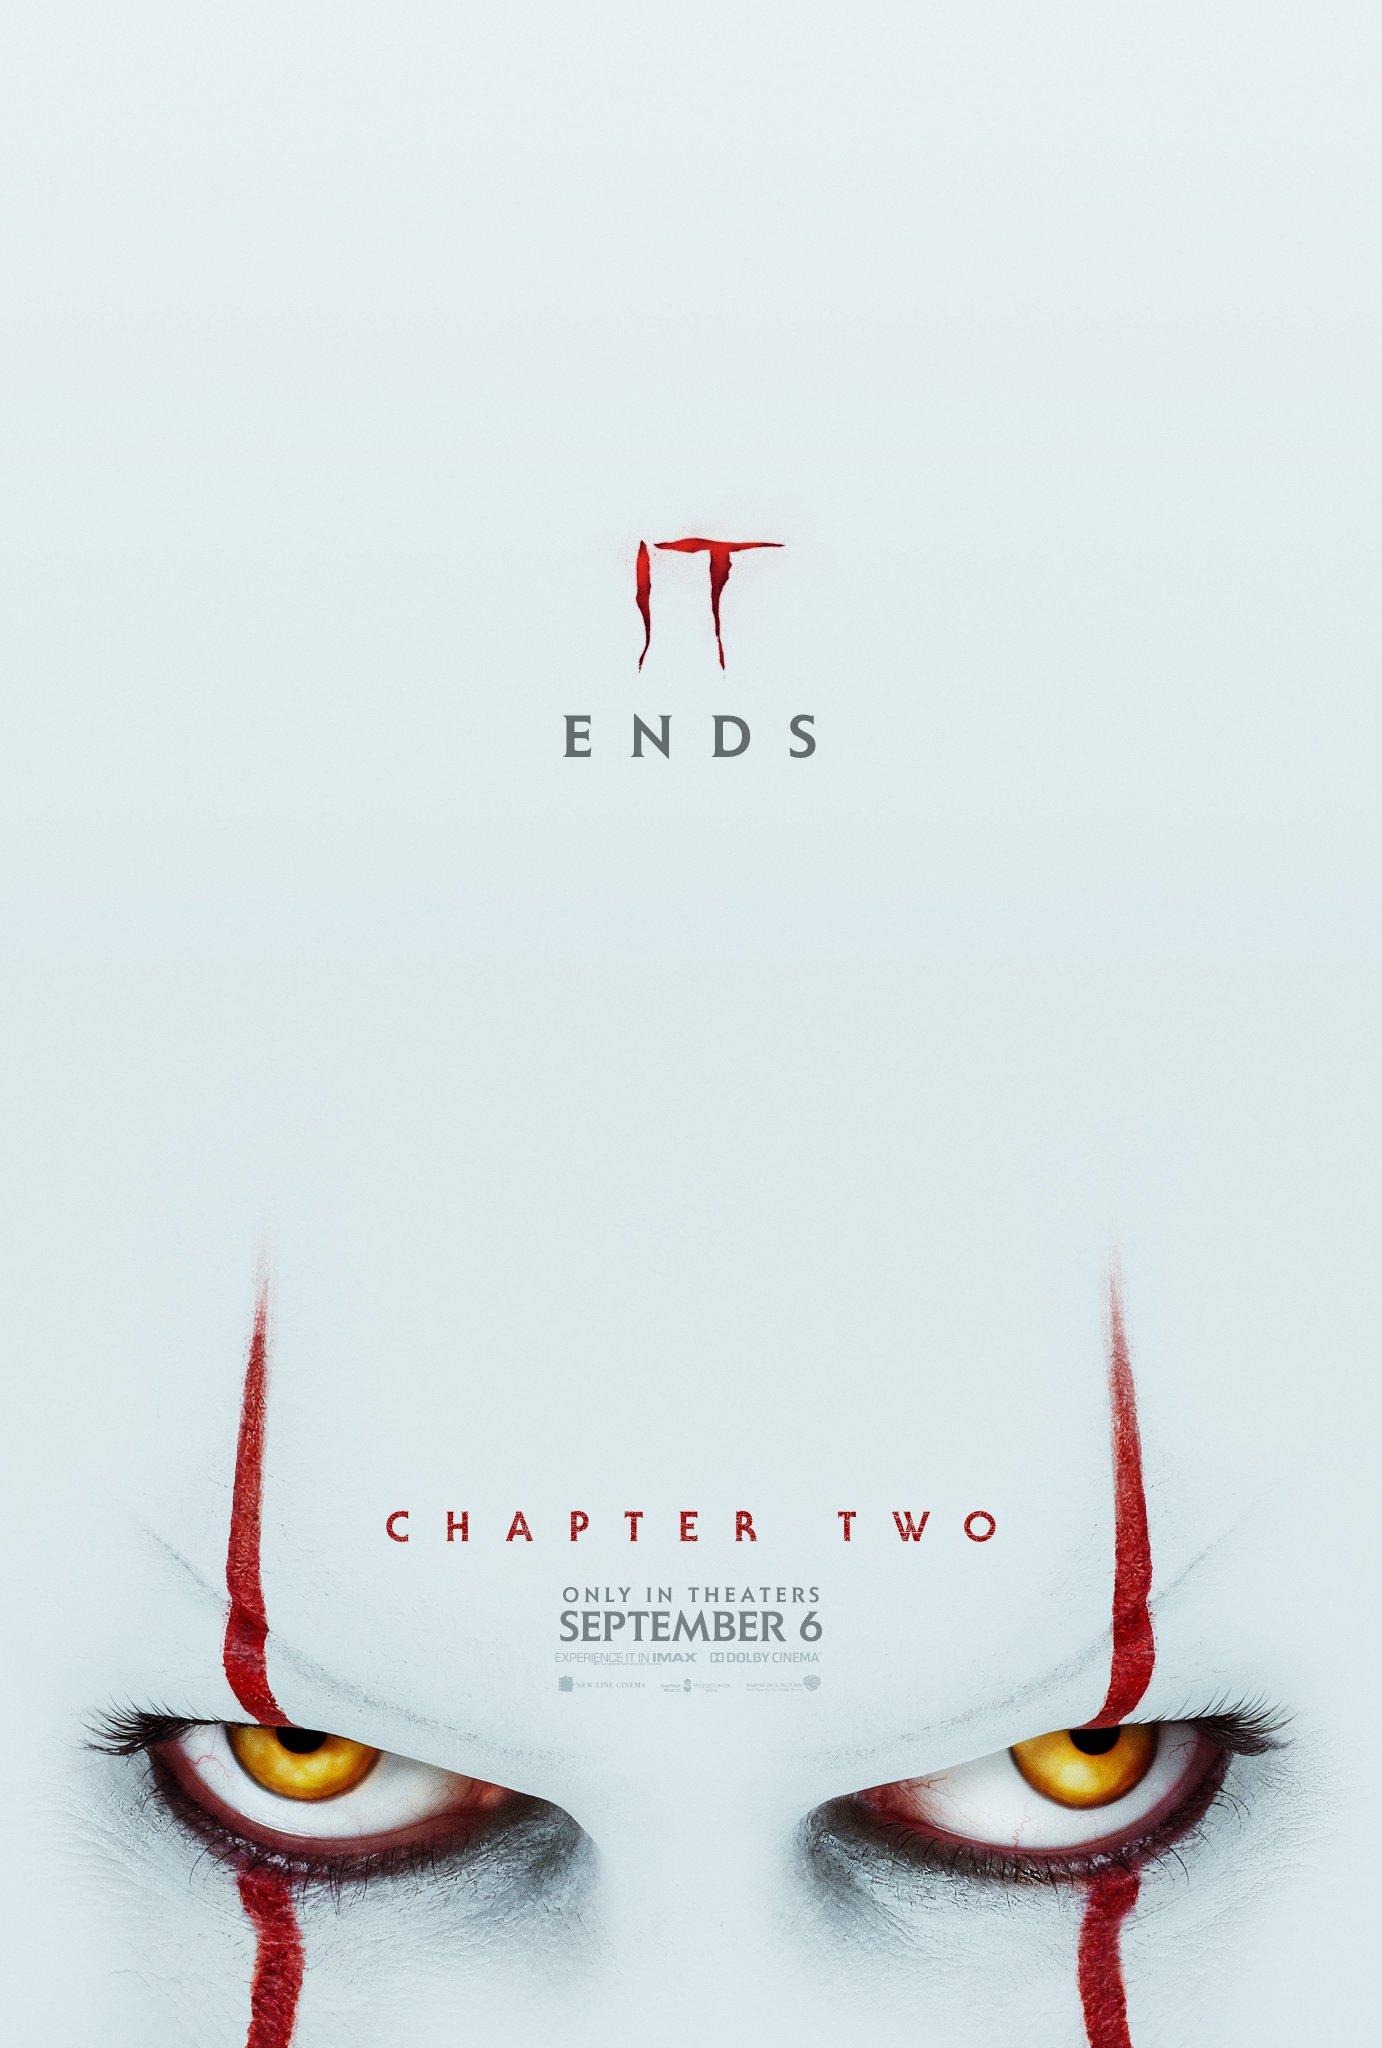 IT ends September 6. Trailer TOMORROW 9AM PT. 🎈🎈#ITMovie https://t.co/JY6o96JioH